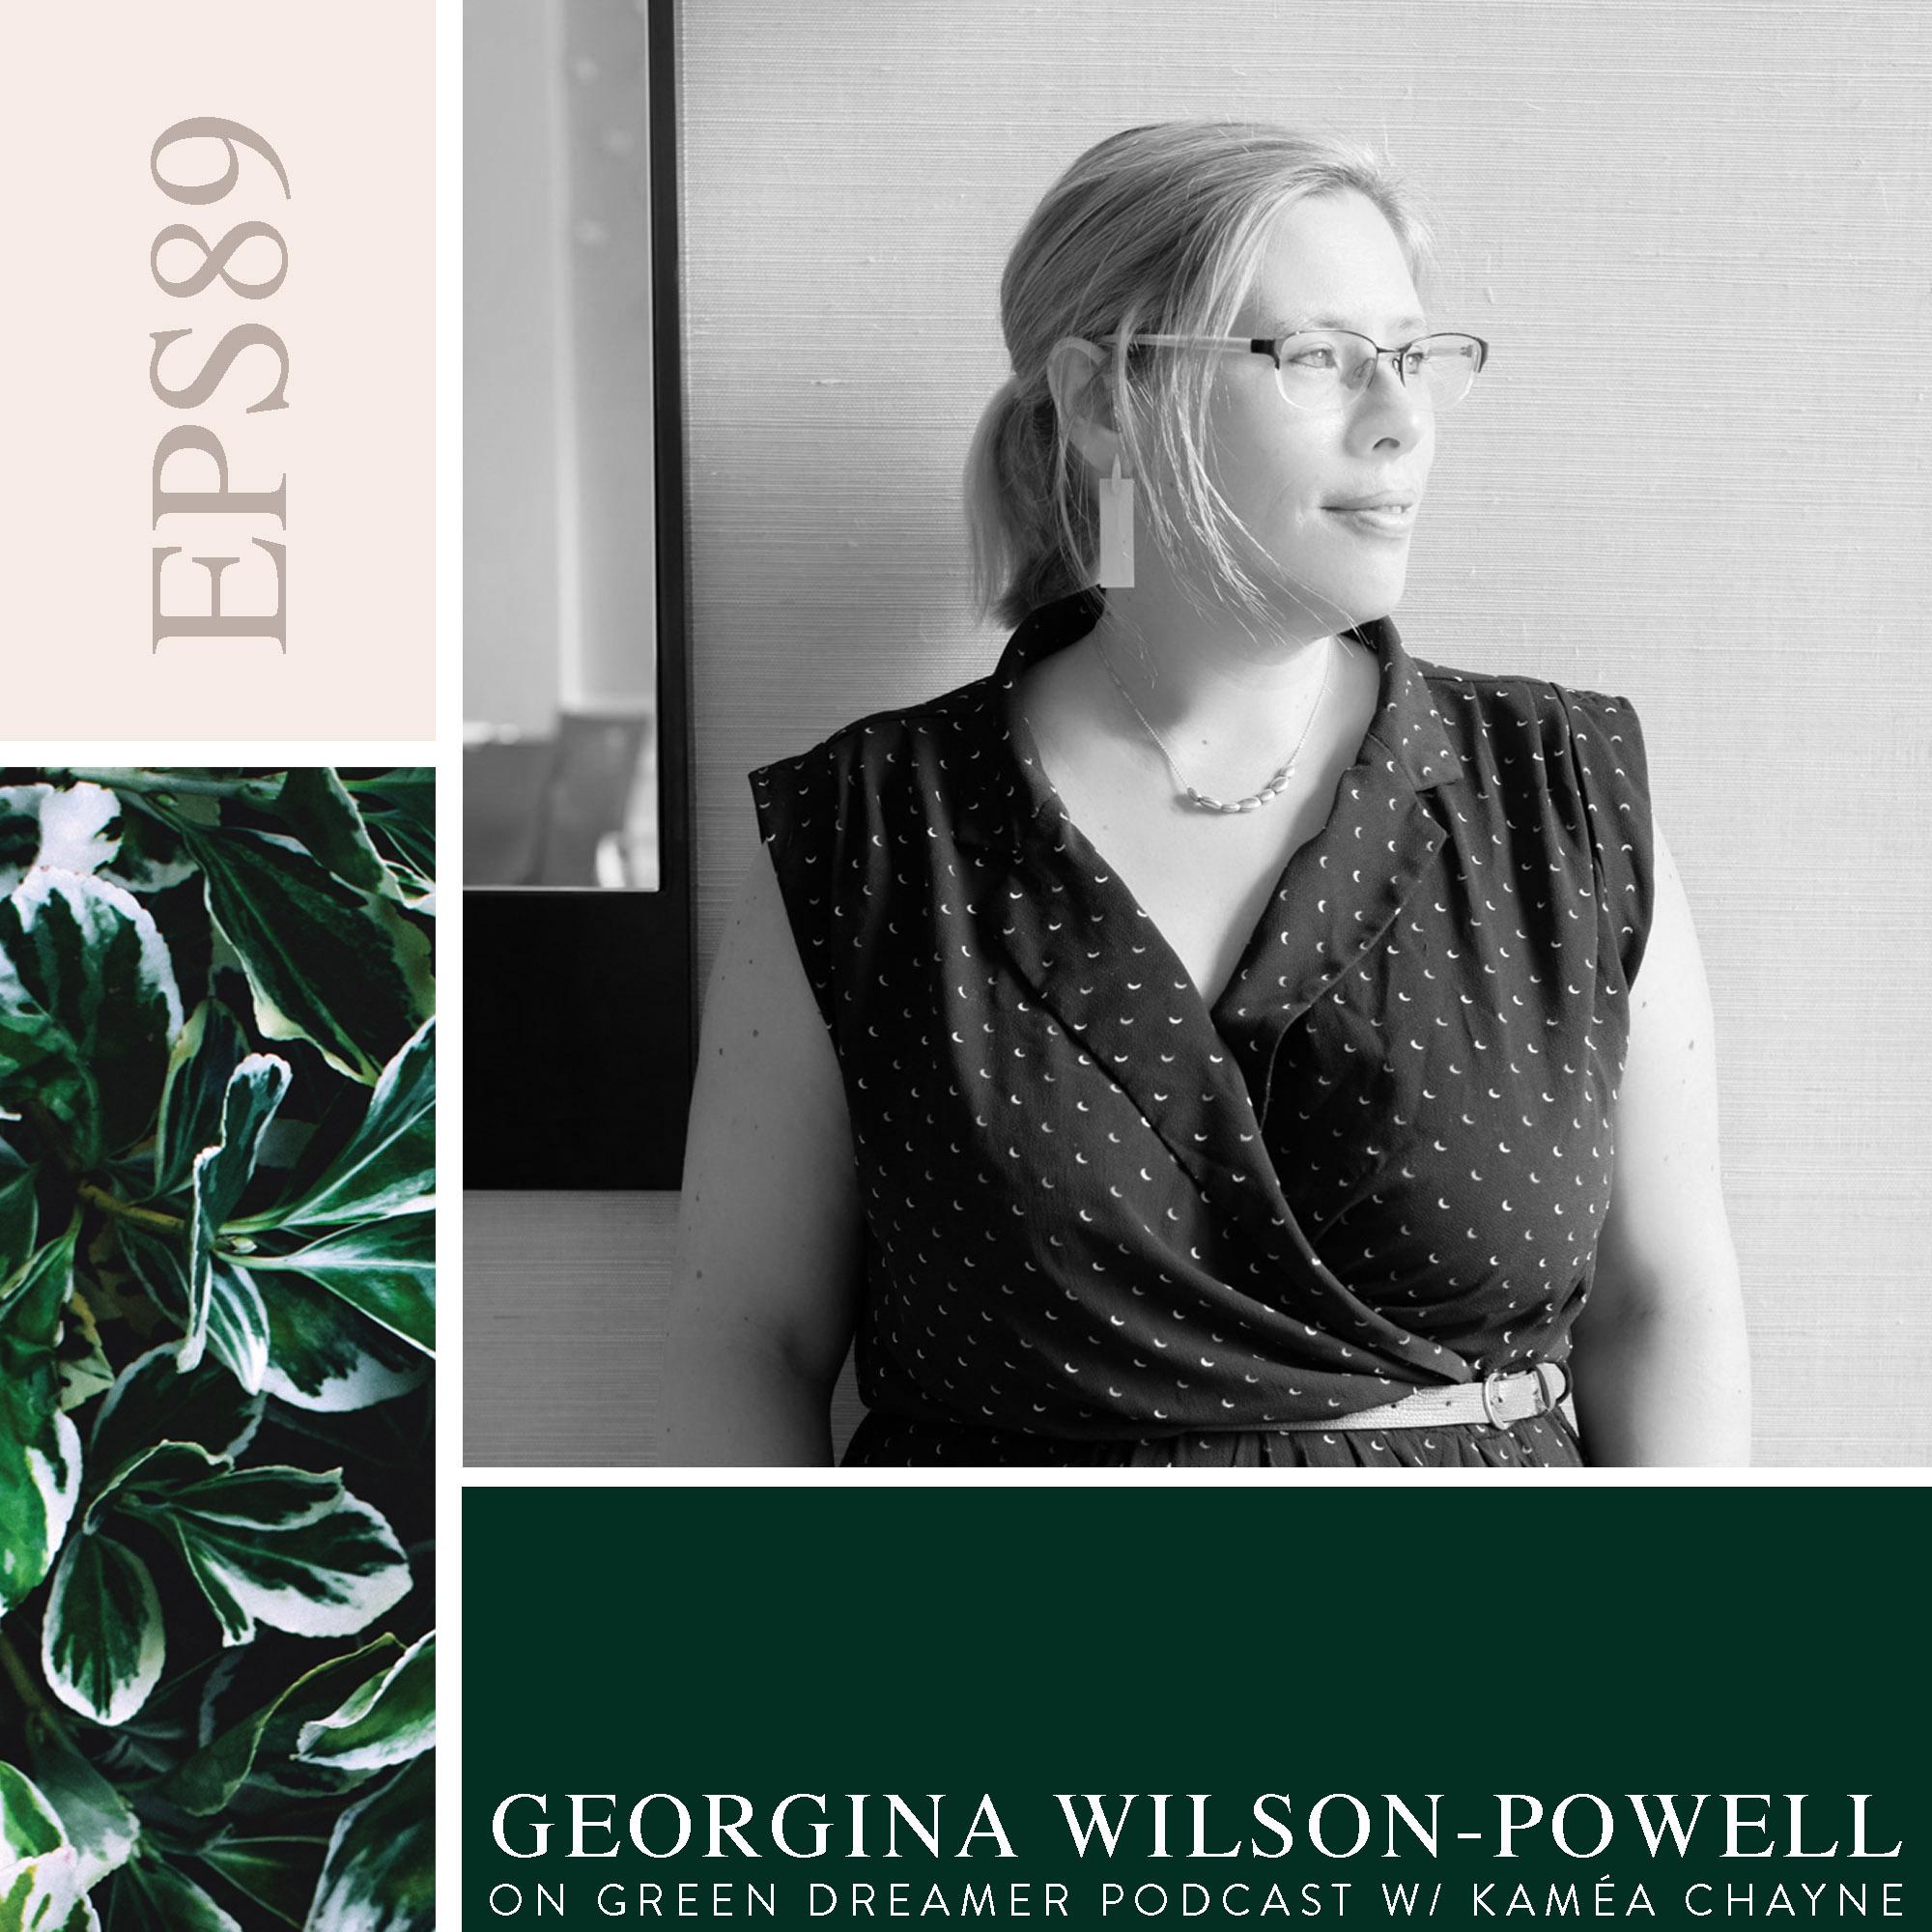 89) BW Georgine Wilson-Powell of Pebble Magazine talks Sustainability on Green Dreamer Podcast with Kamea Chayne (1).jpg